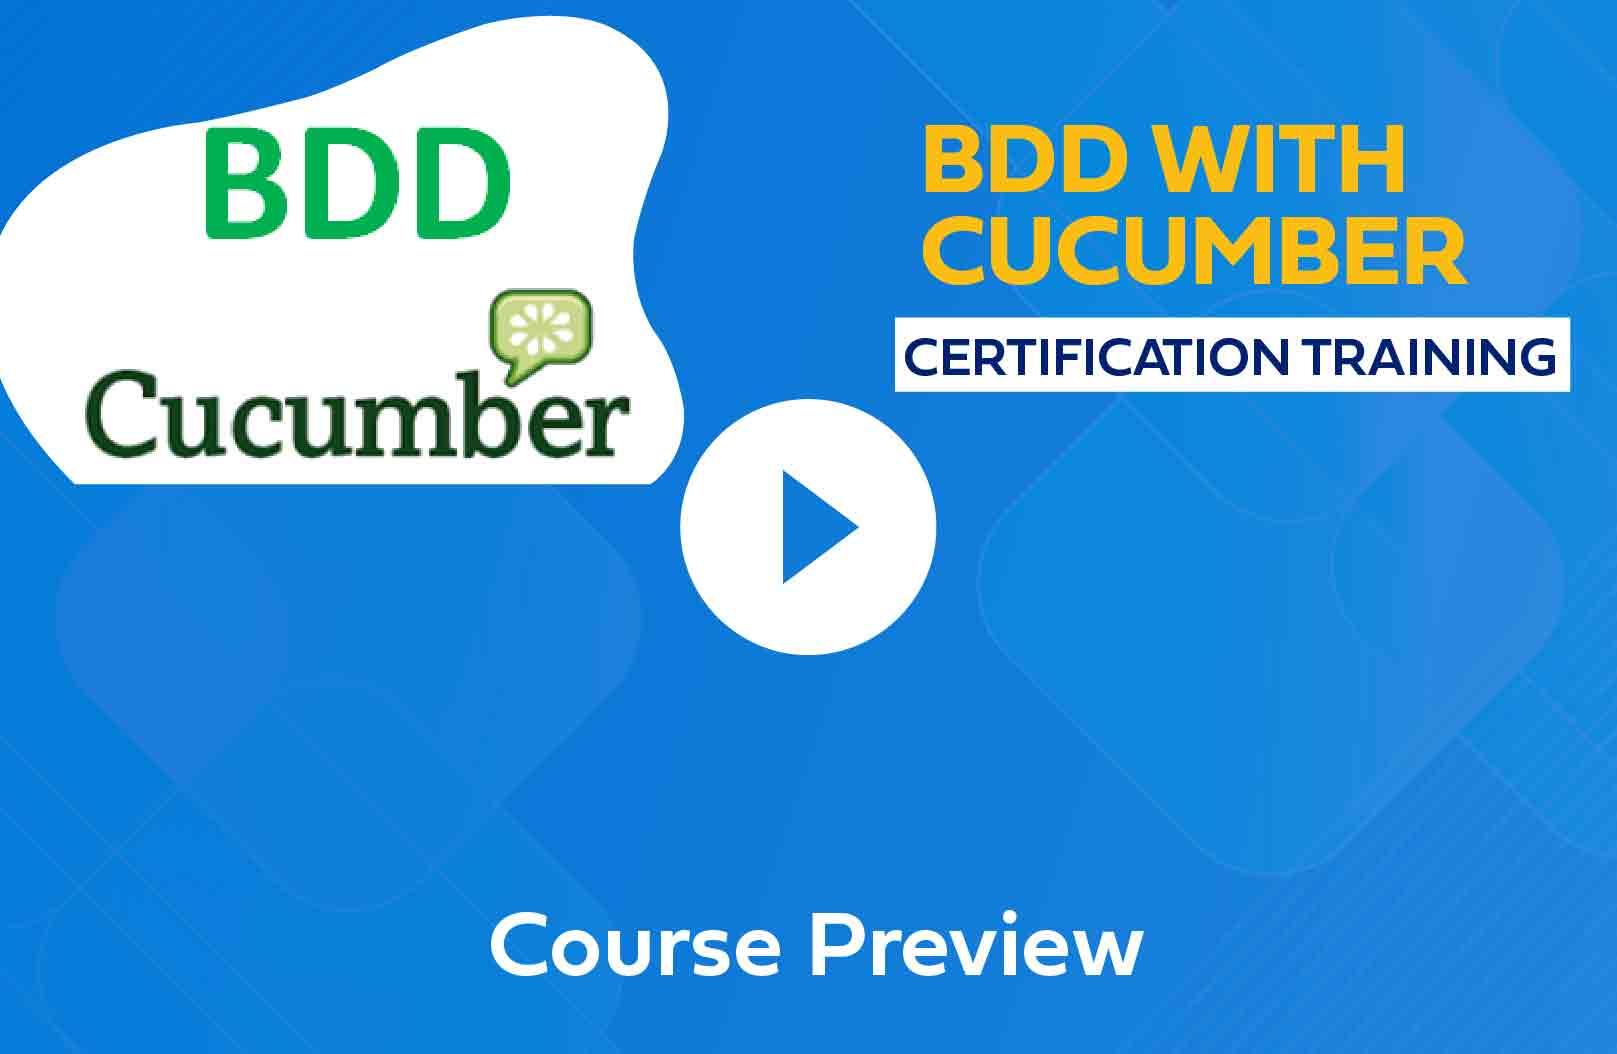 BDD with Cucumber Online Training